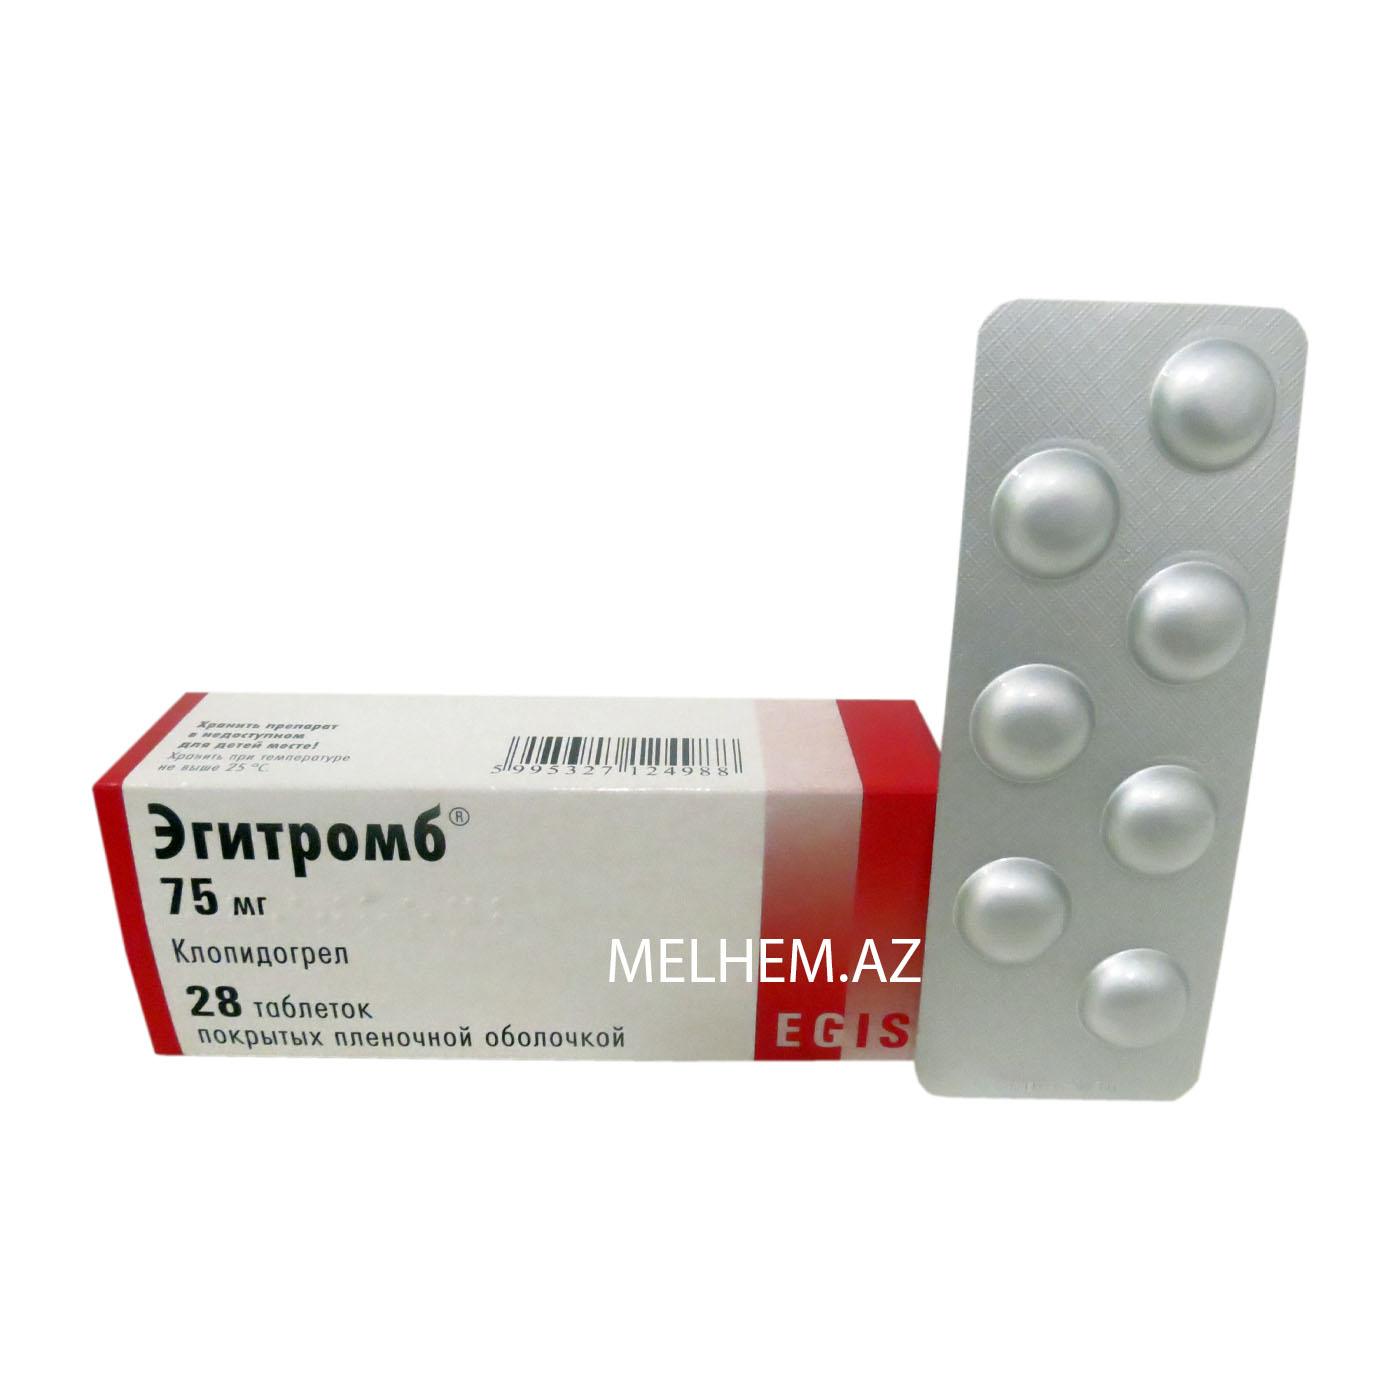 EGİTROMB 75 mg